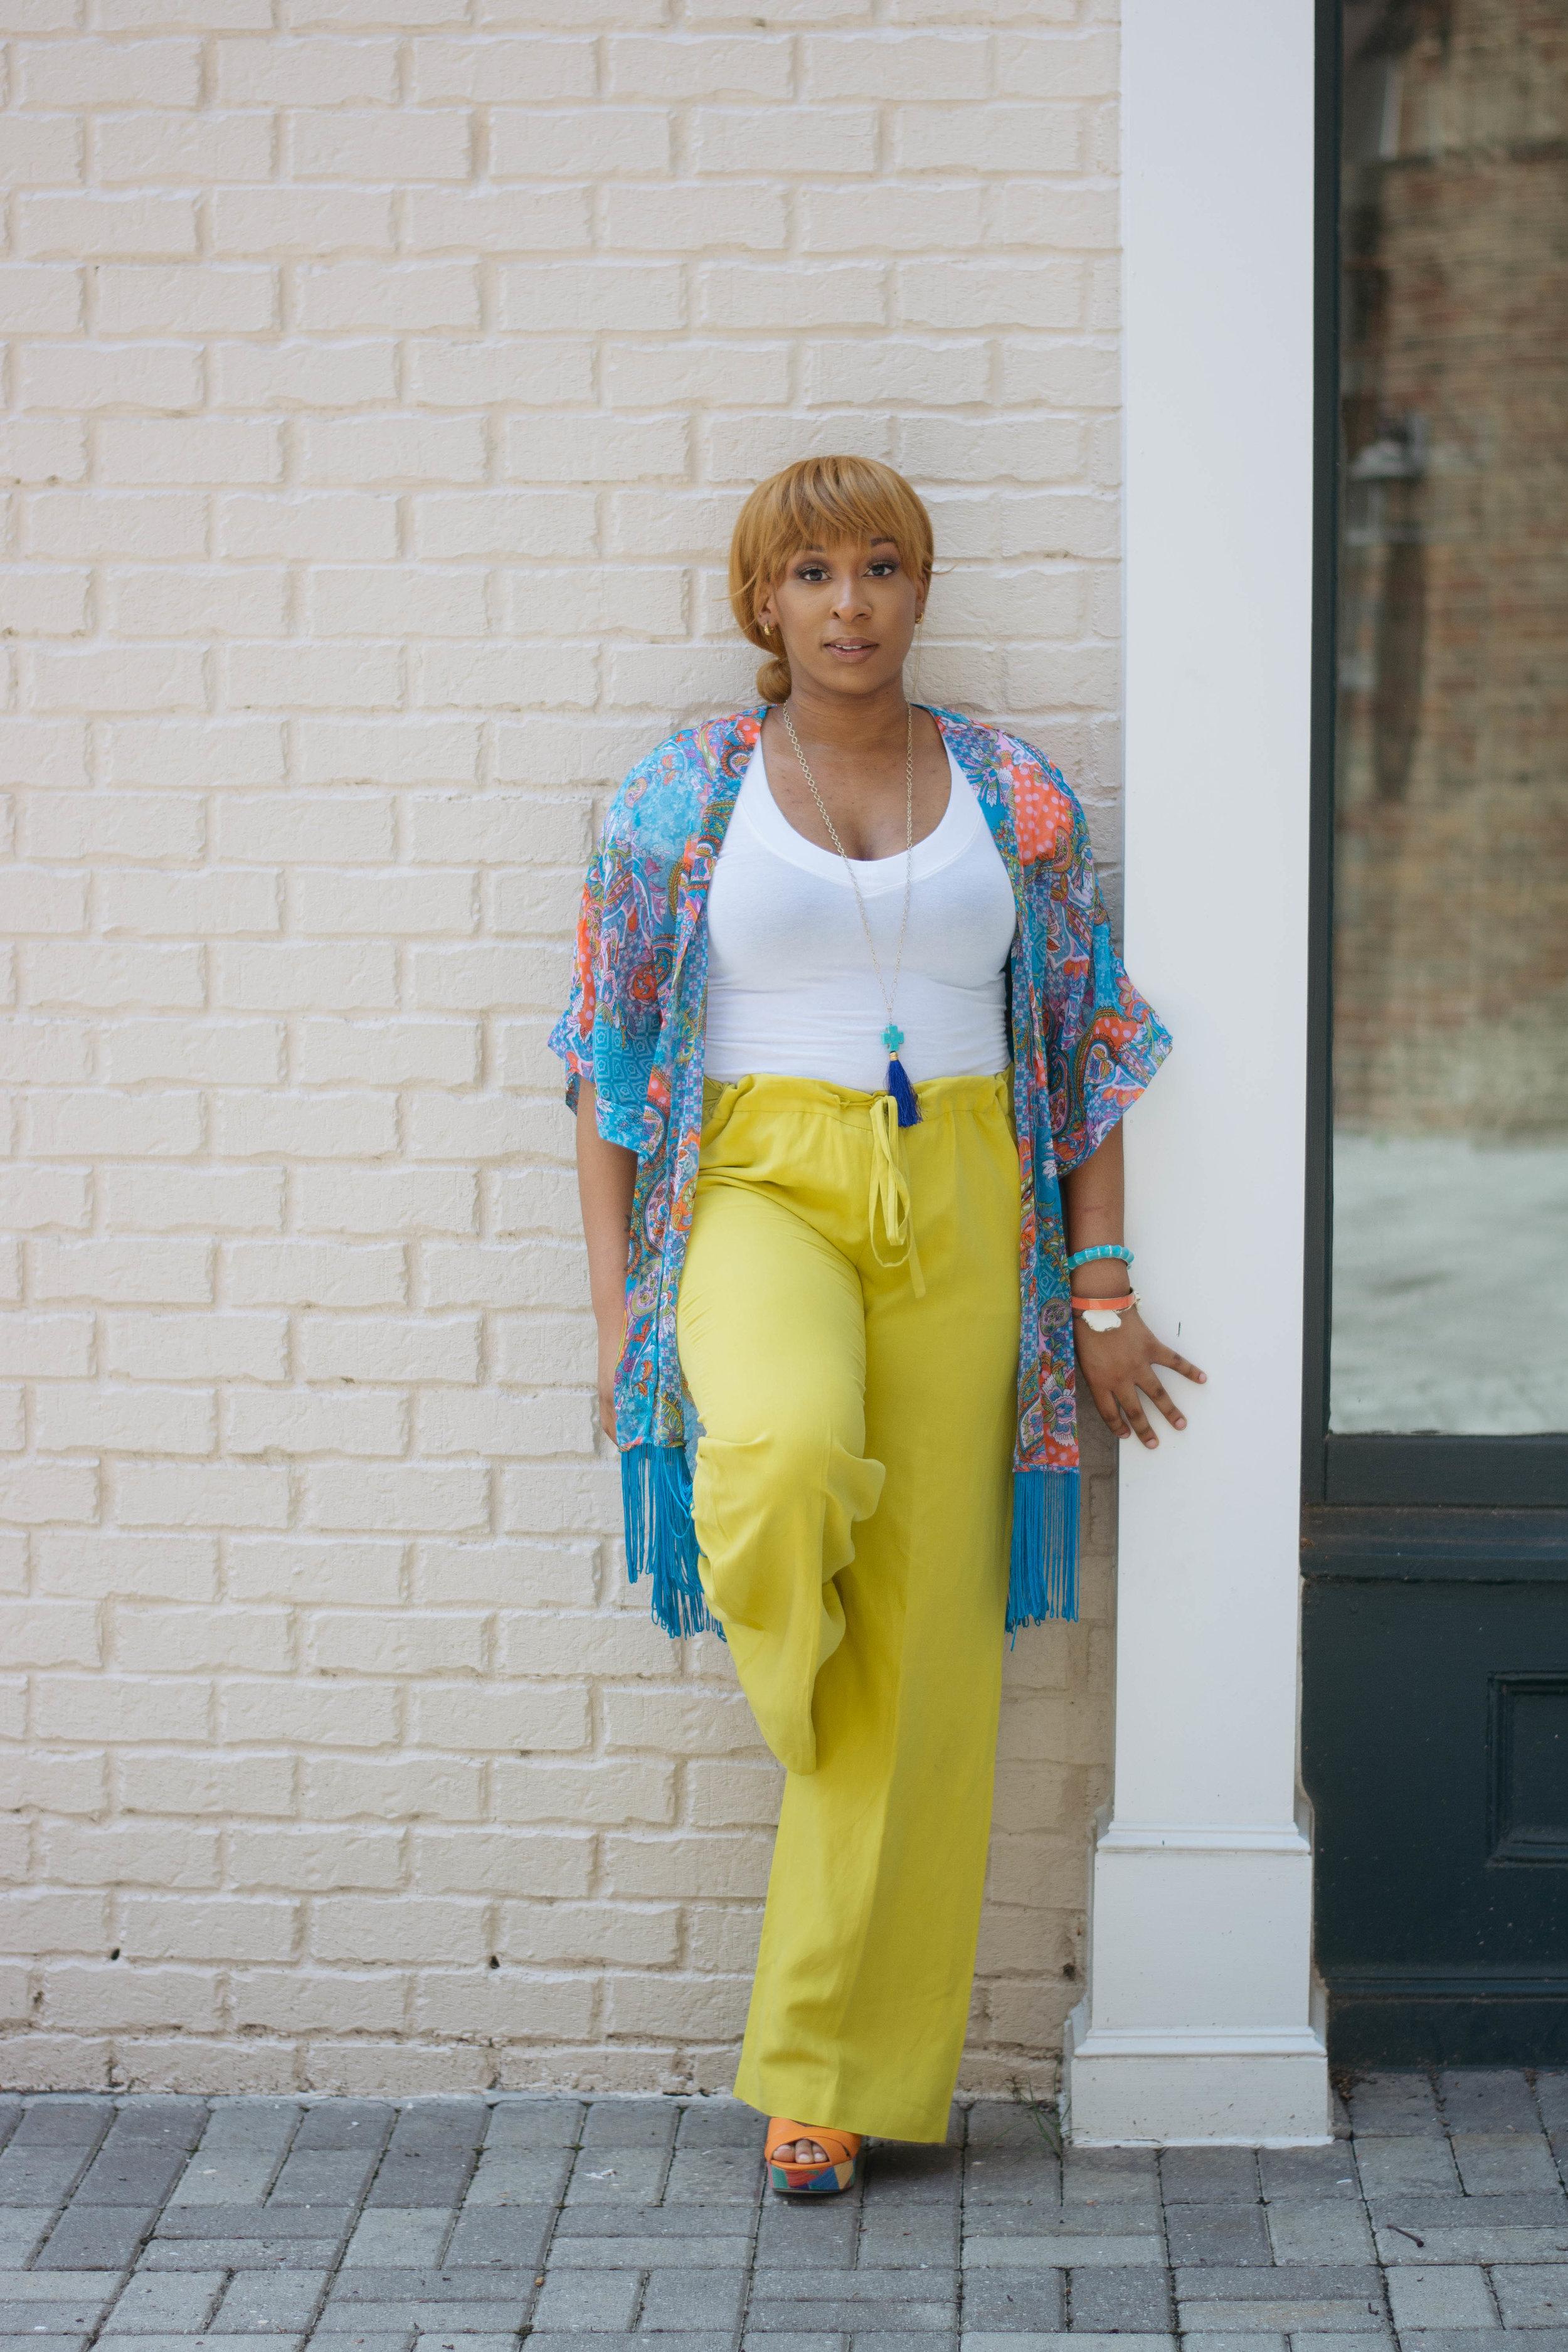 The style klazit, mommy makeover winner, atlanta personal stylist